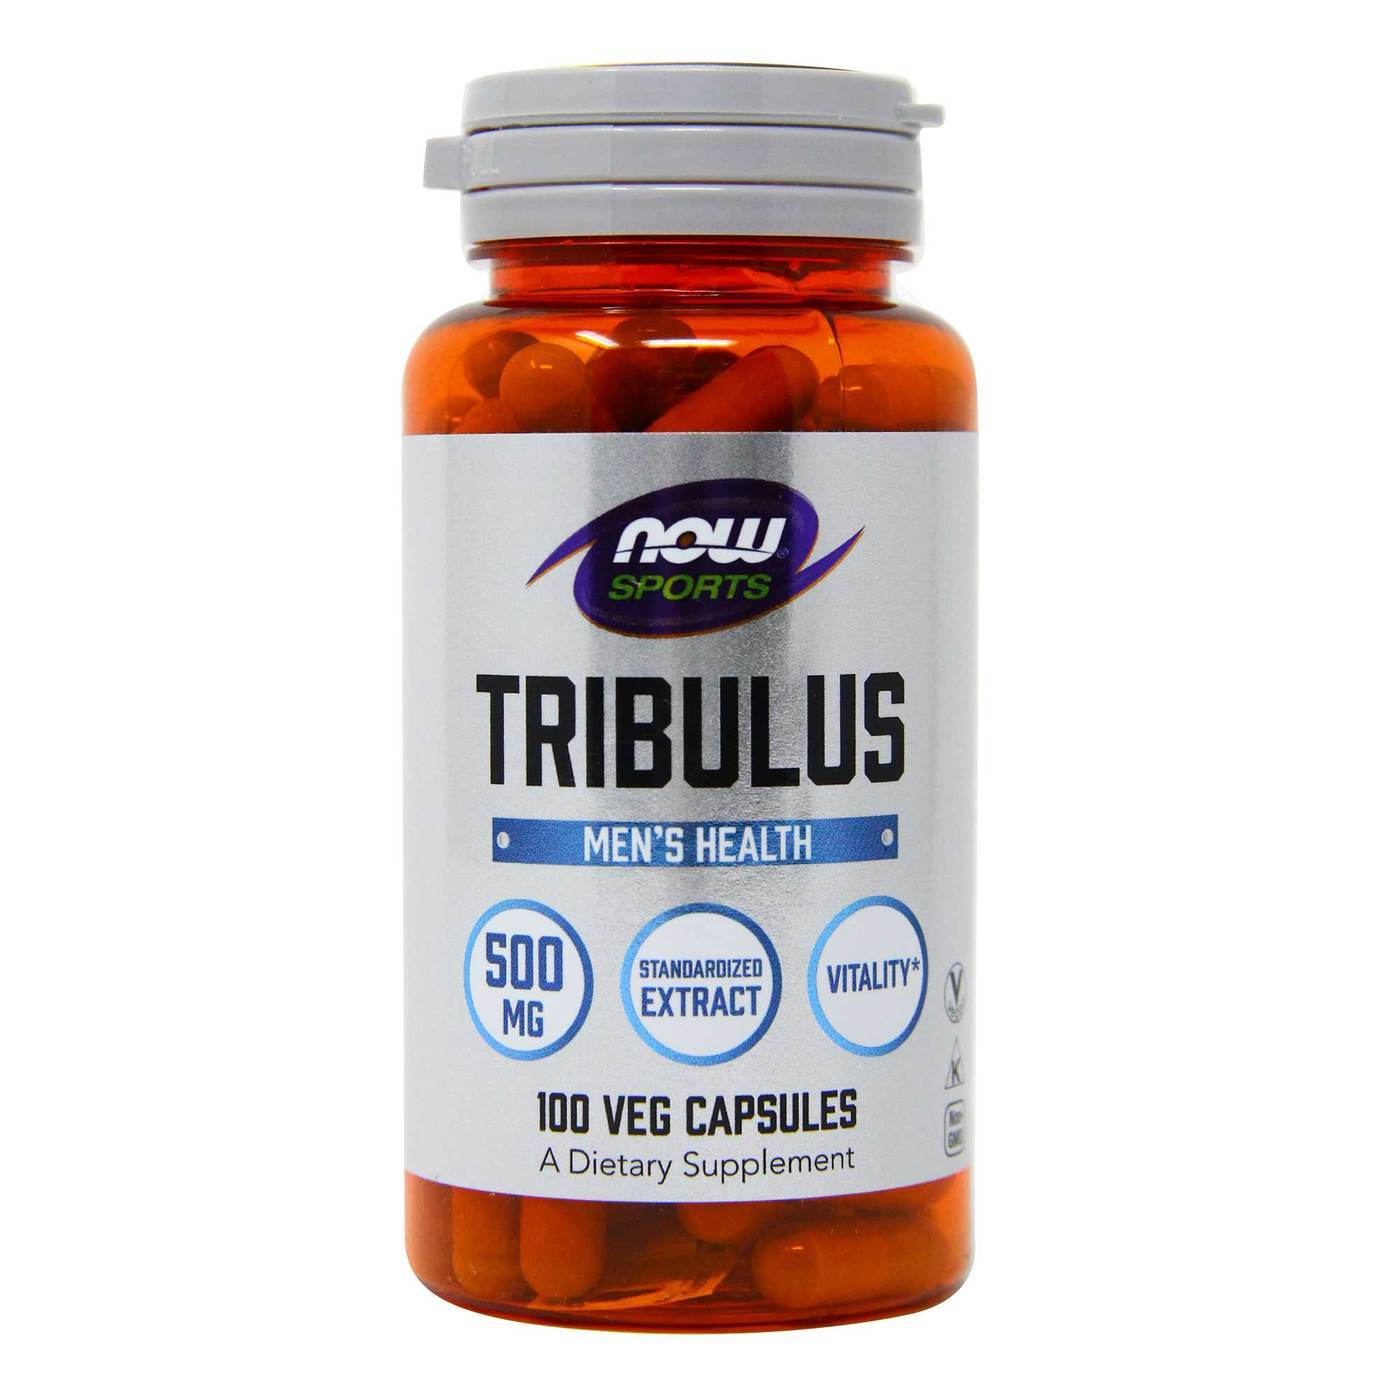 Tribulus - 500 mg - 100 Capsules